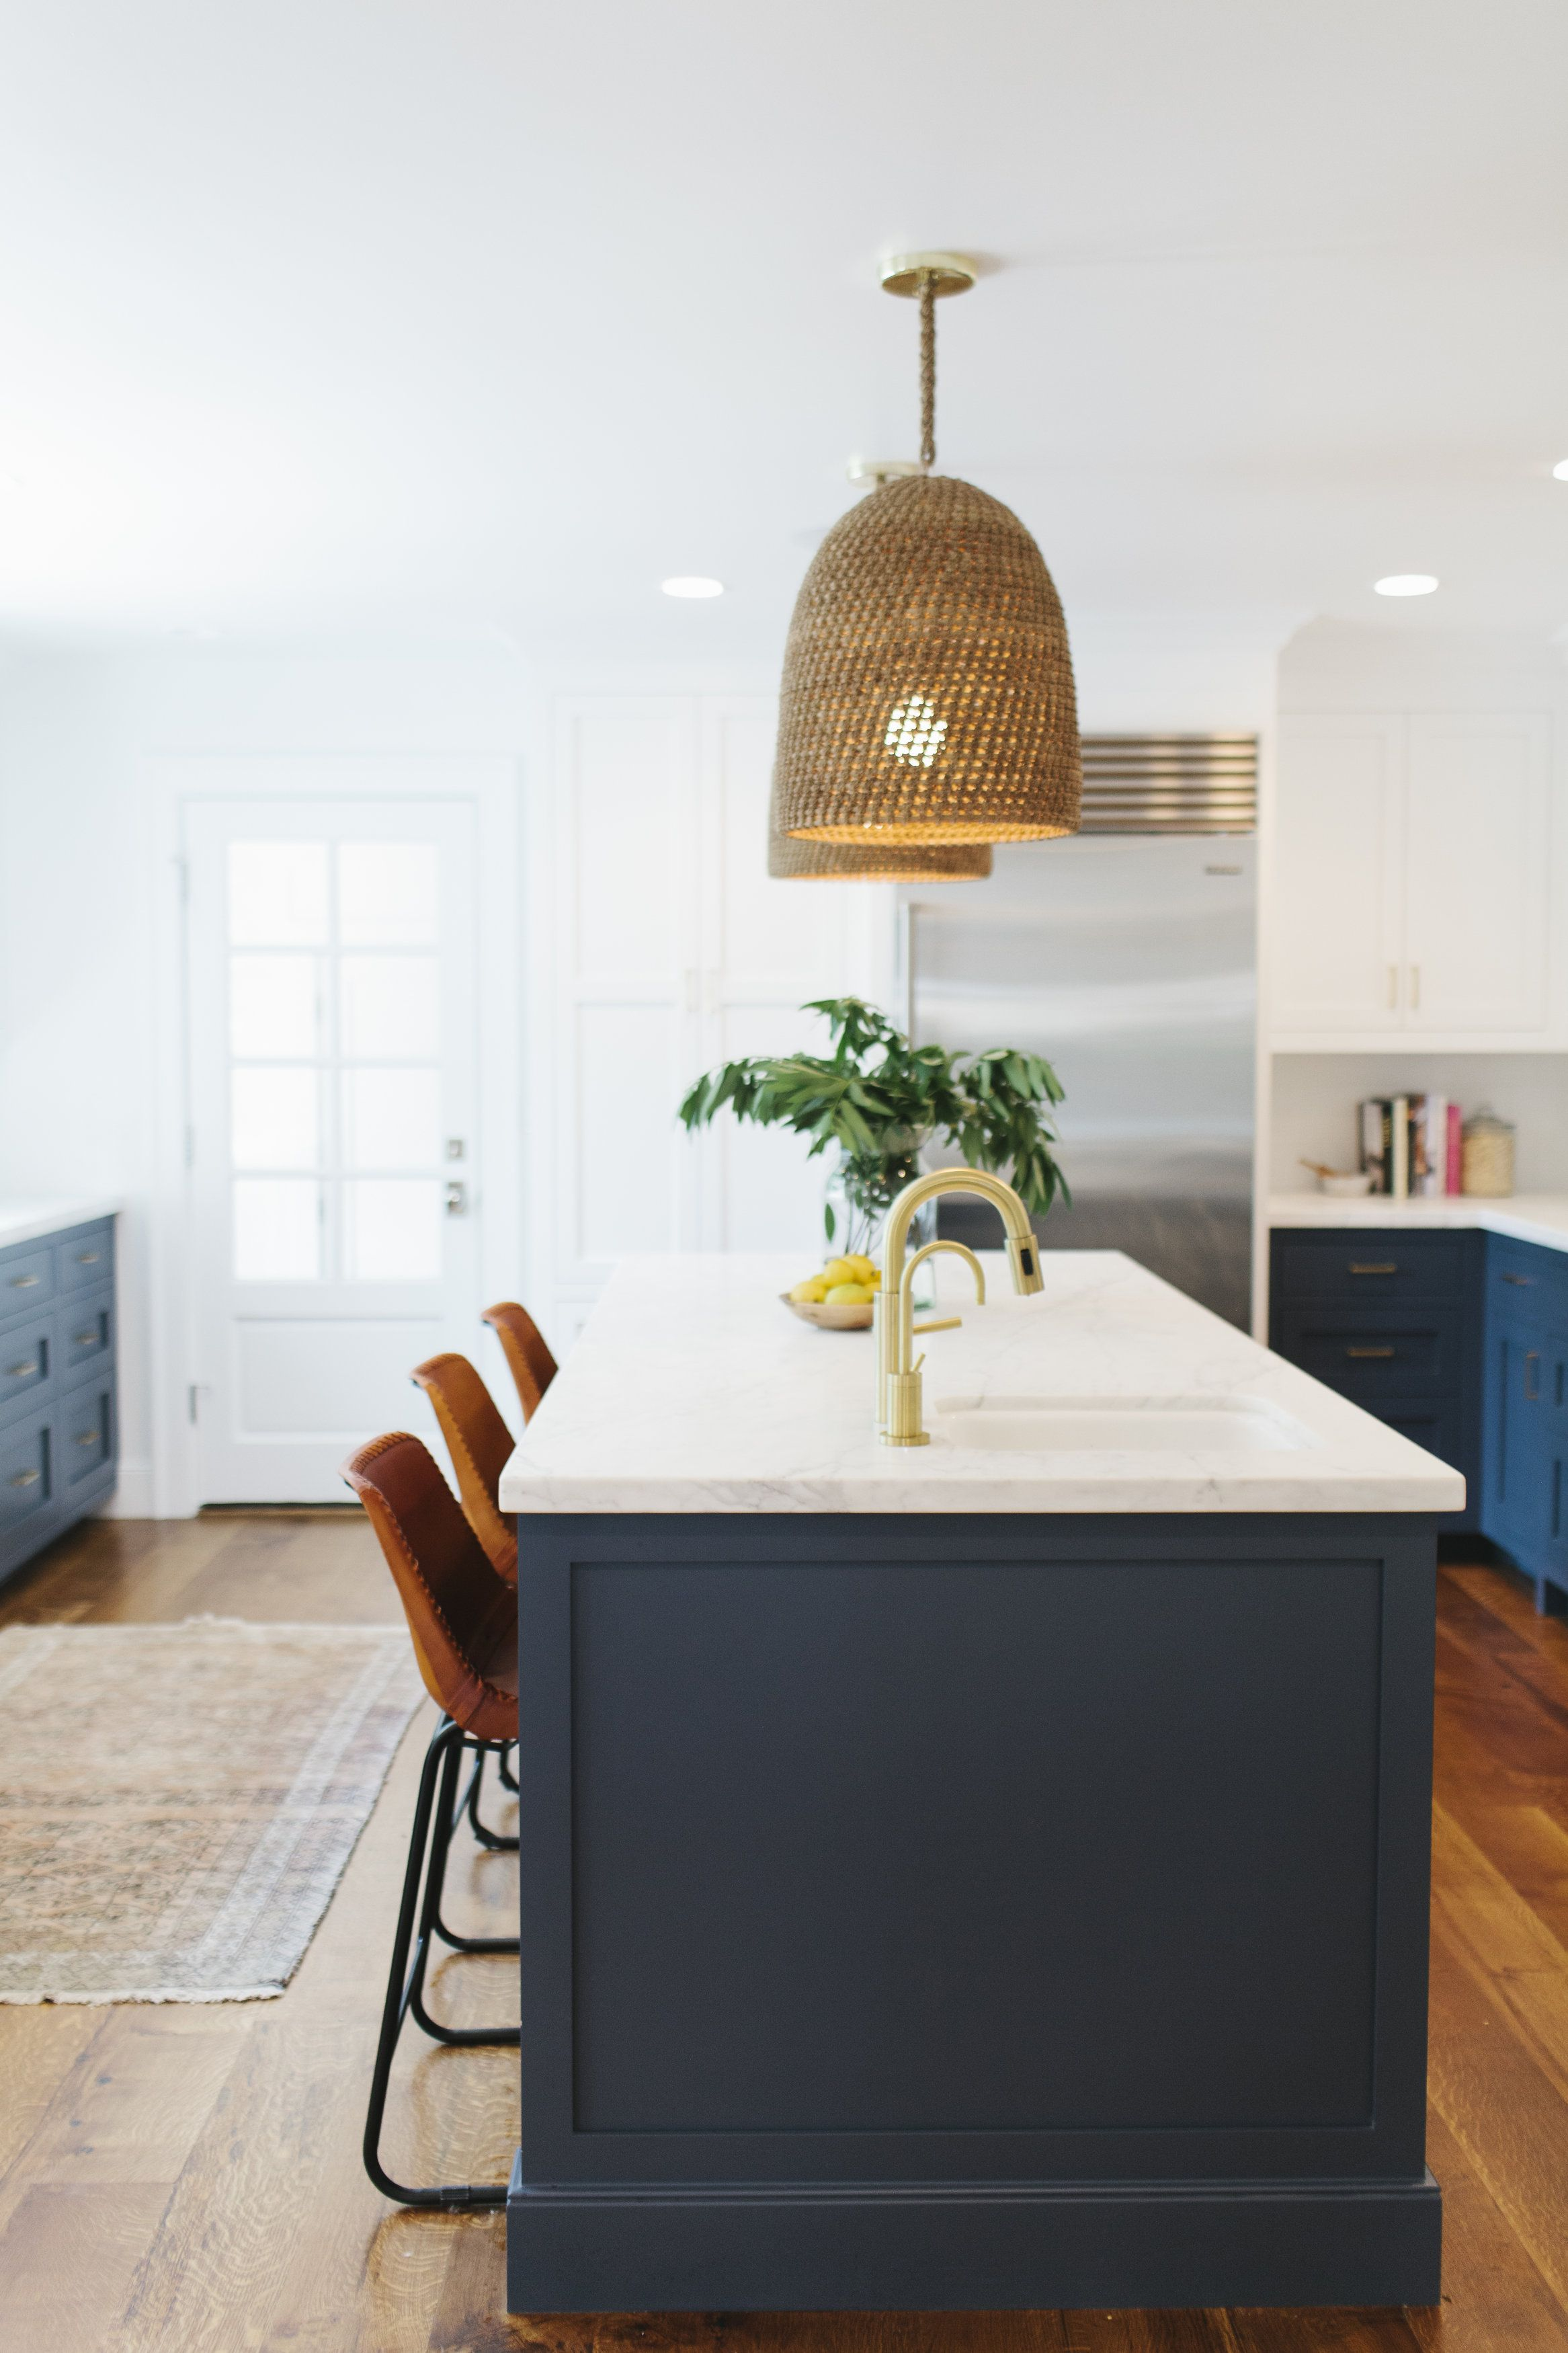 Lynwood Remodel: Kitchen | Studio mcgee, Stools and Hardware